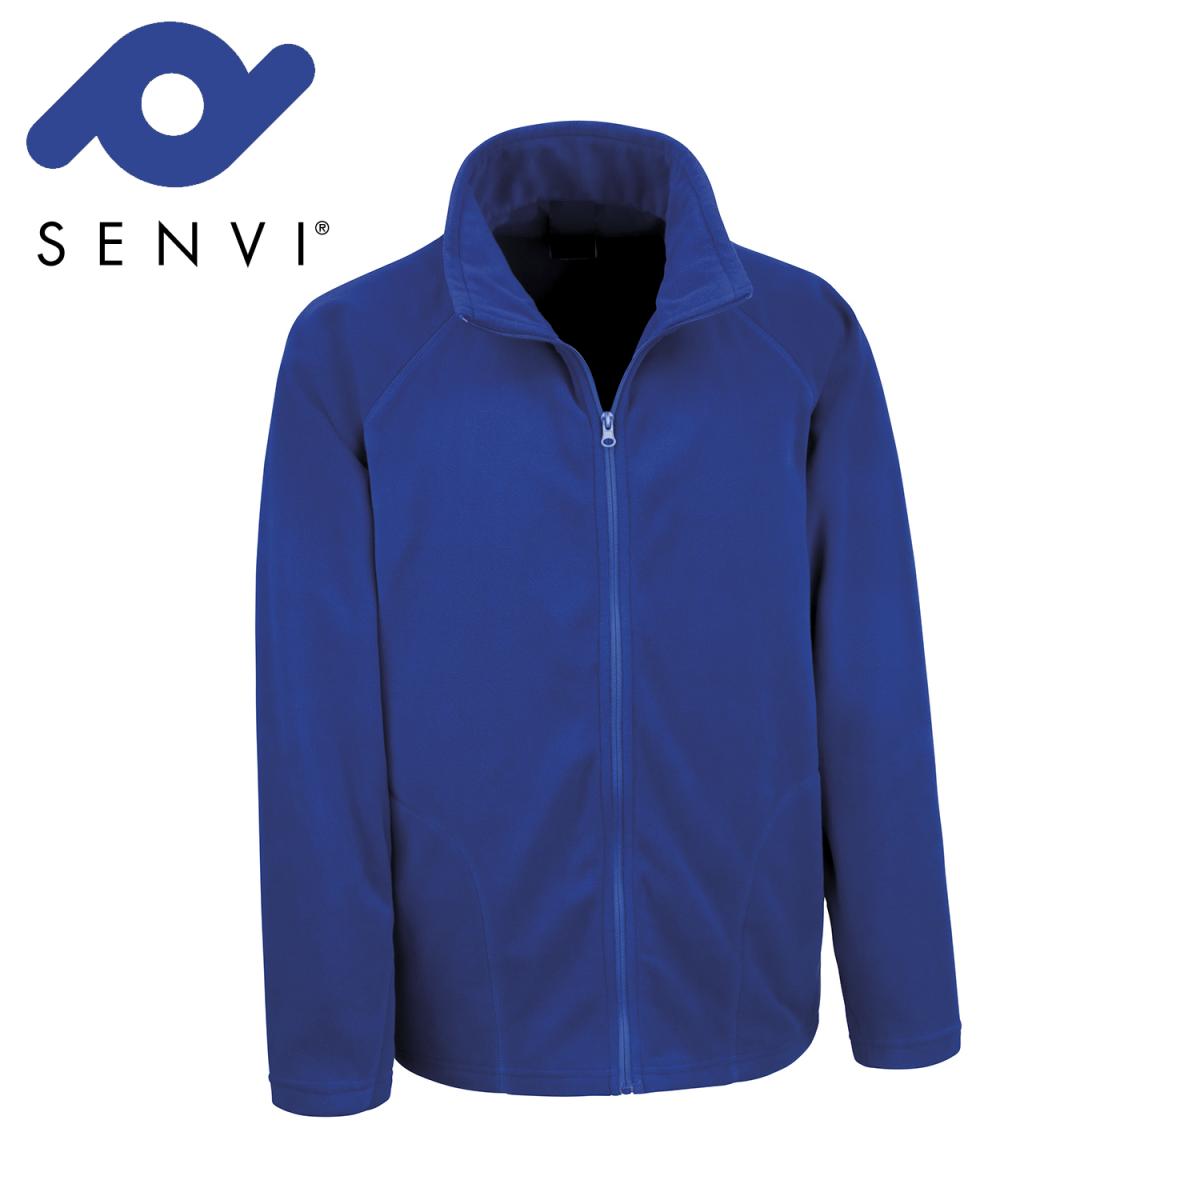 Senvi Basic Fleece Vest - Thermisch laag microfleece - Kleur Royal - Maat XXXL